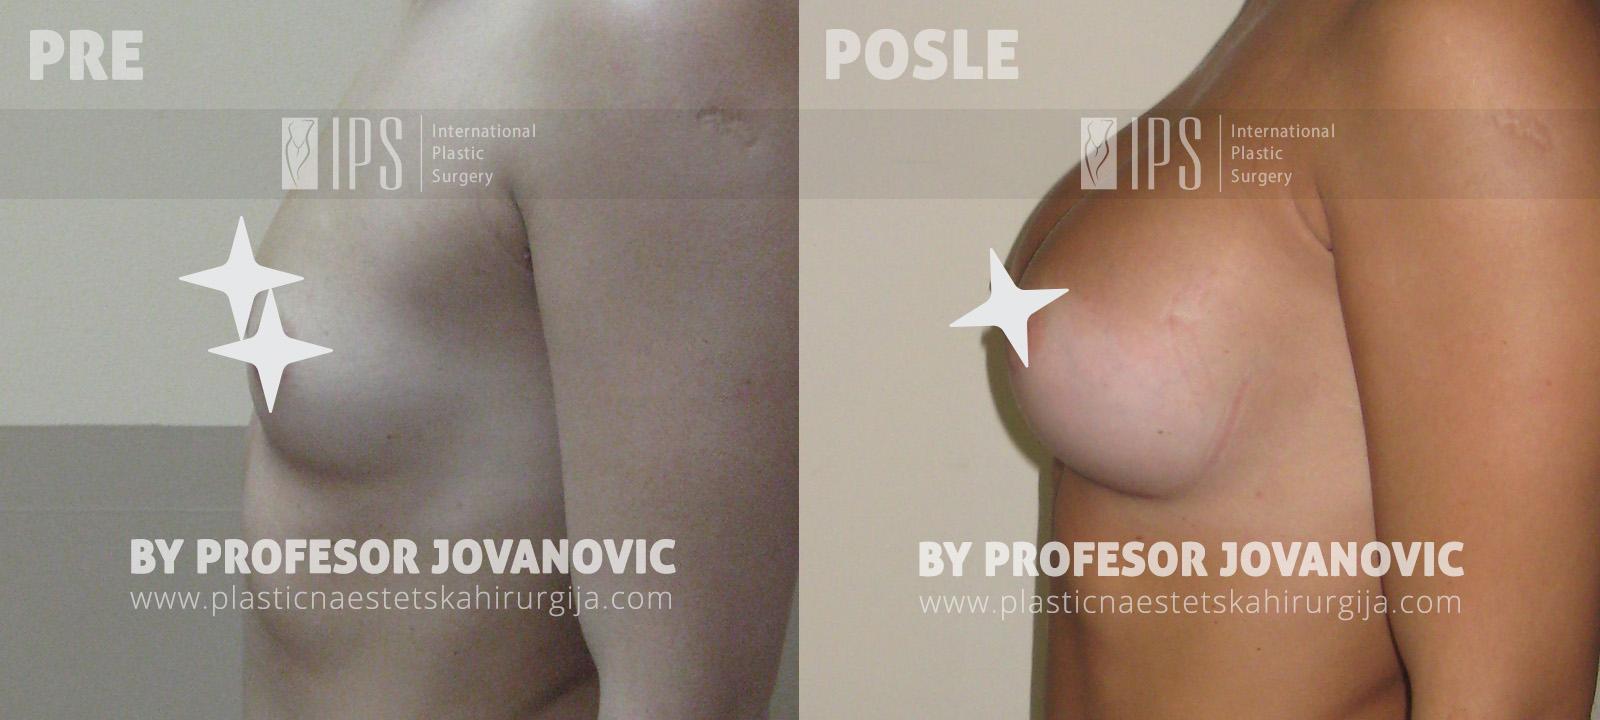 Povećanje grudi - pre i posle, levi bok